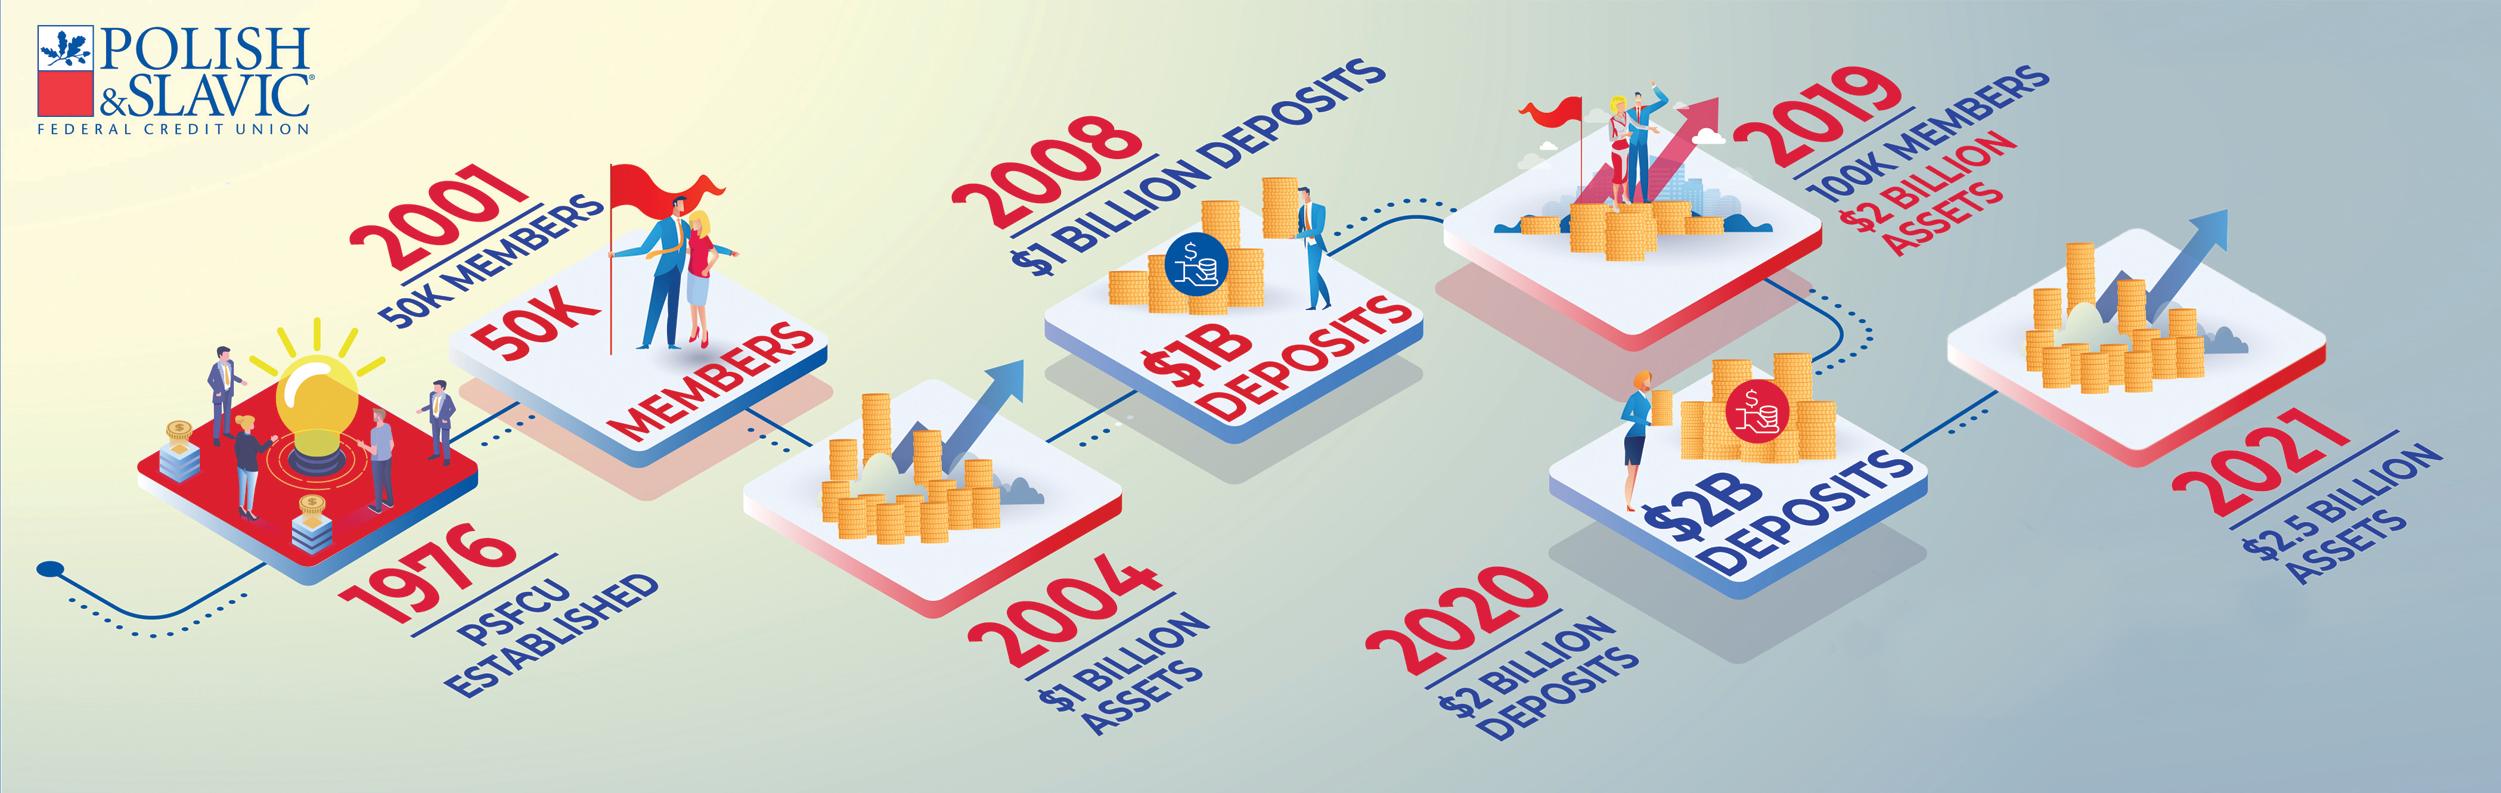 PSFCU Assets Exceeded $2.5 Billion